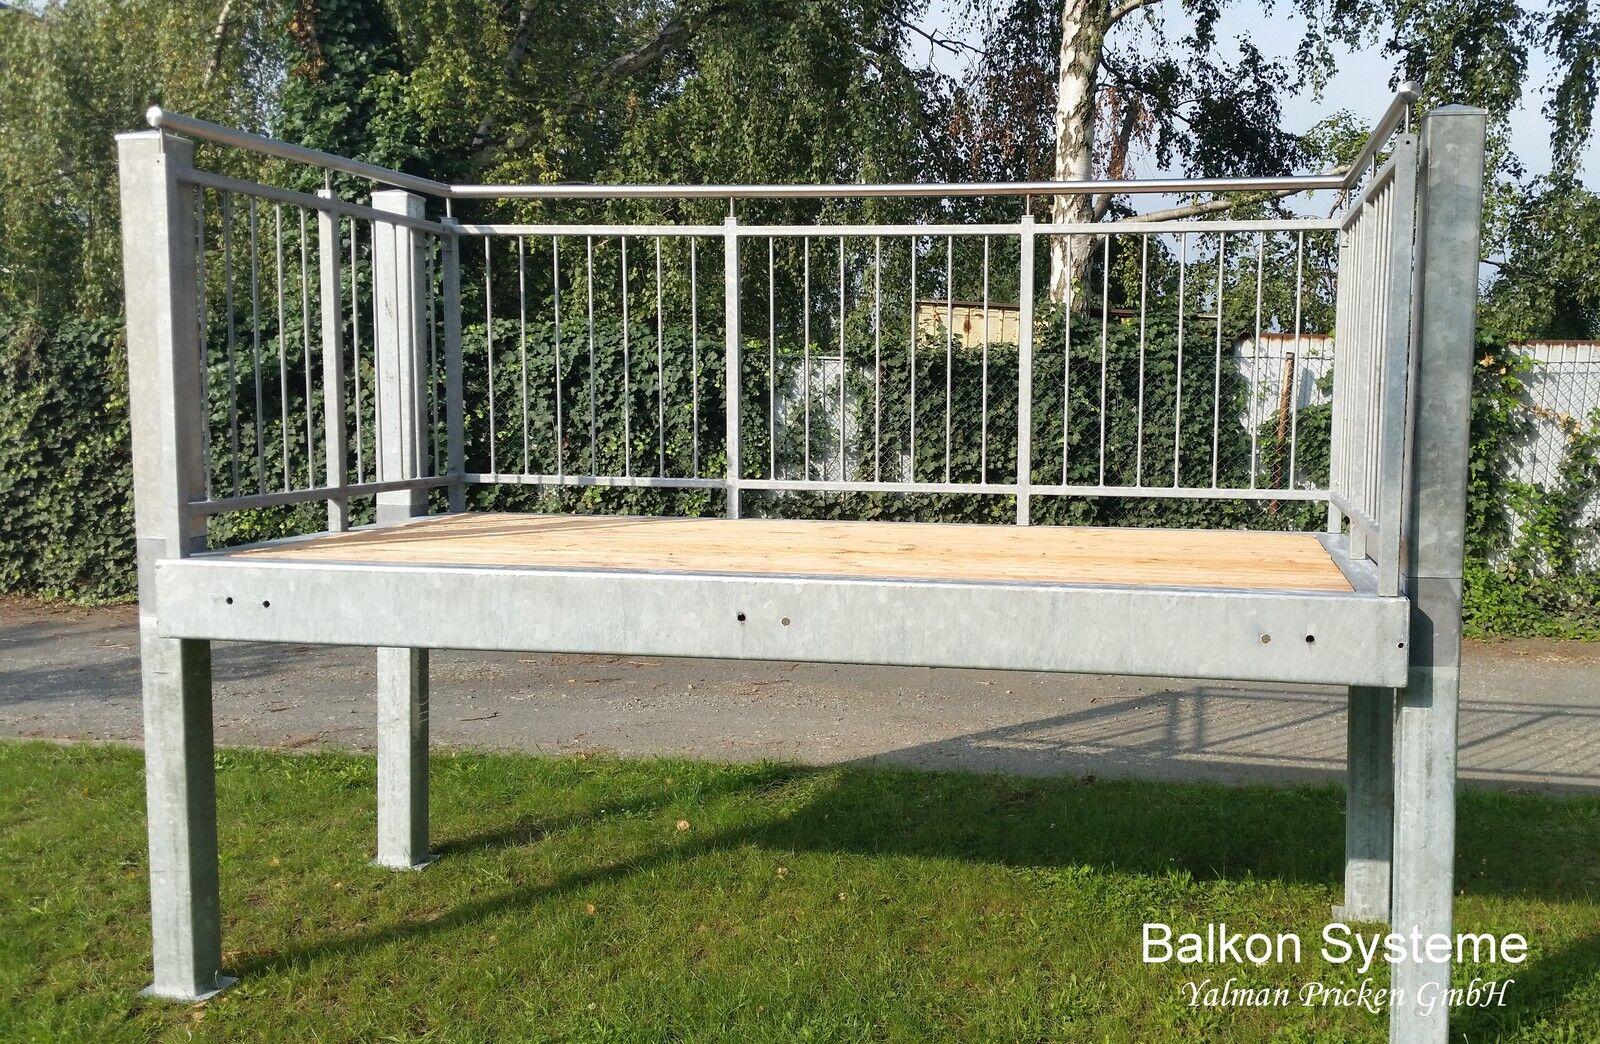 balkon bausatz fertigbalkon anbaubalkon stahl feuerverzinkt wunsch ma eur 630 00 picclick de. Black Bedroom Furniture Sets. Home Design Ideas